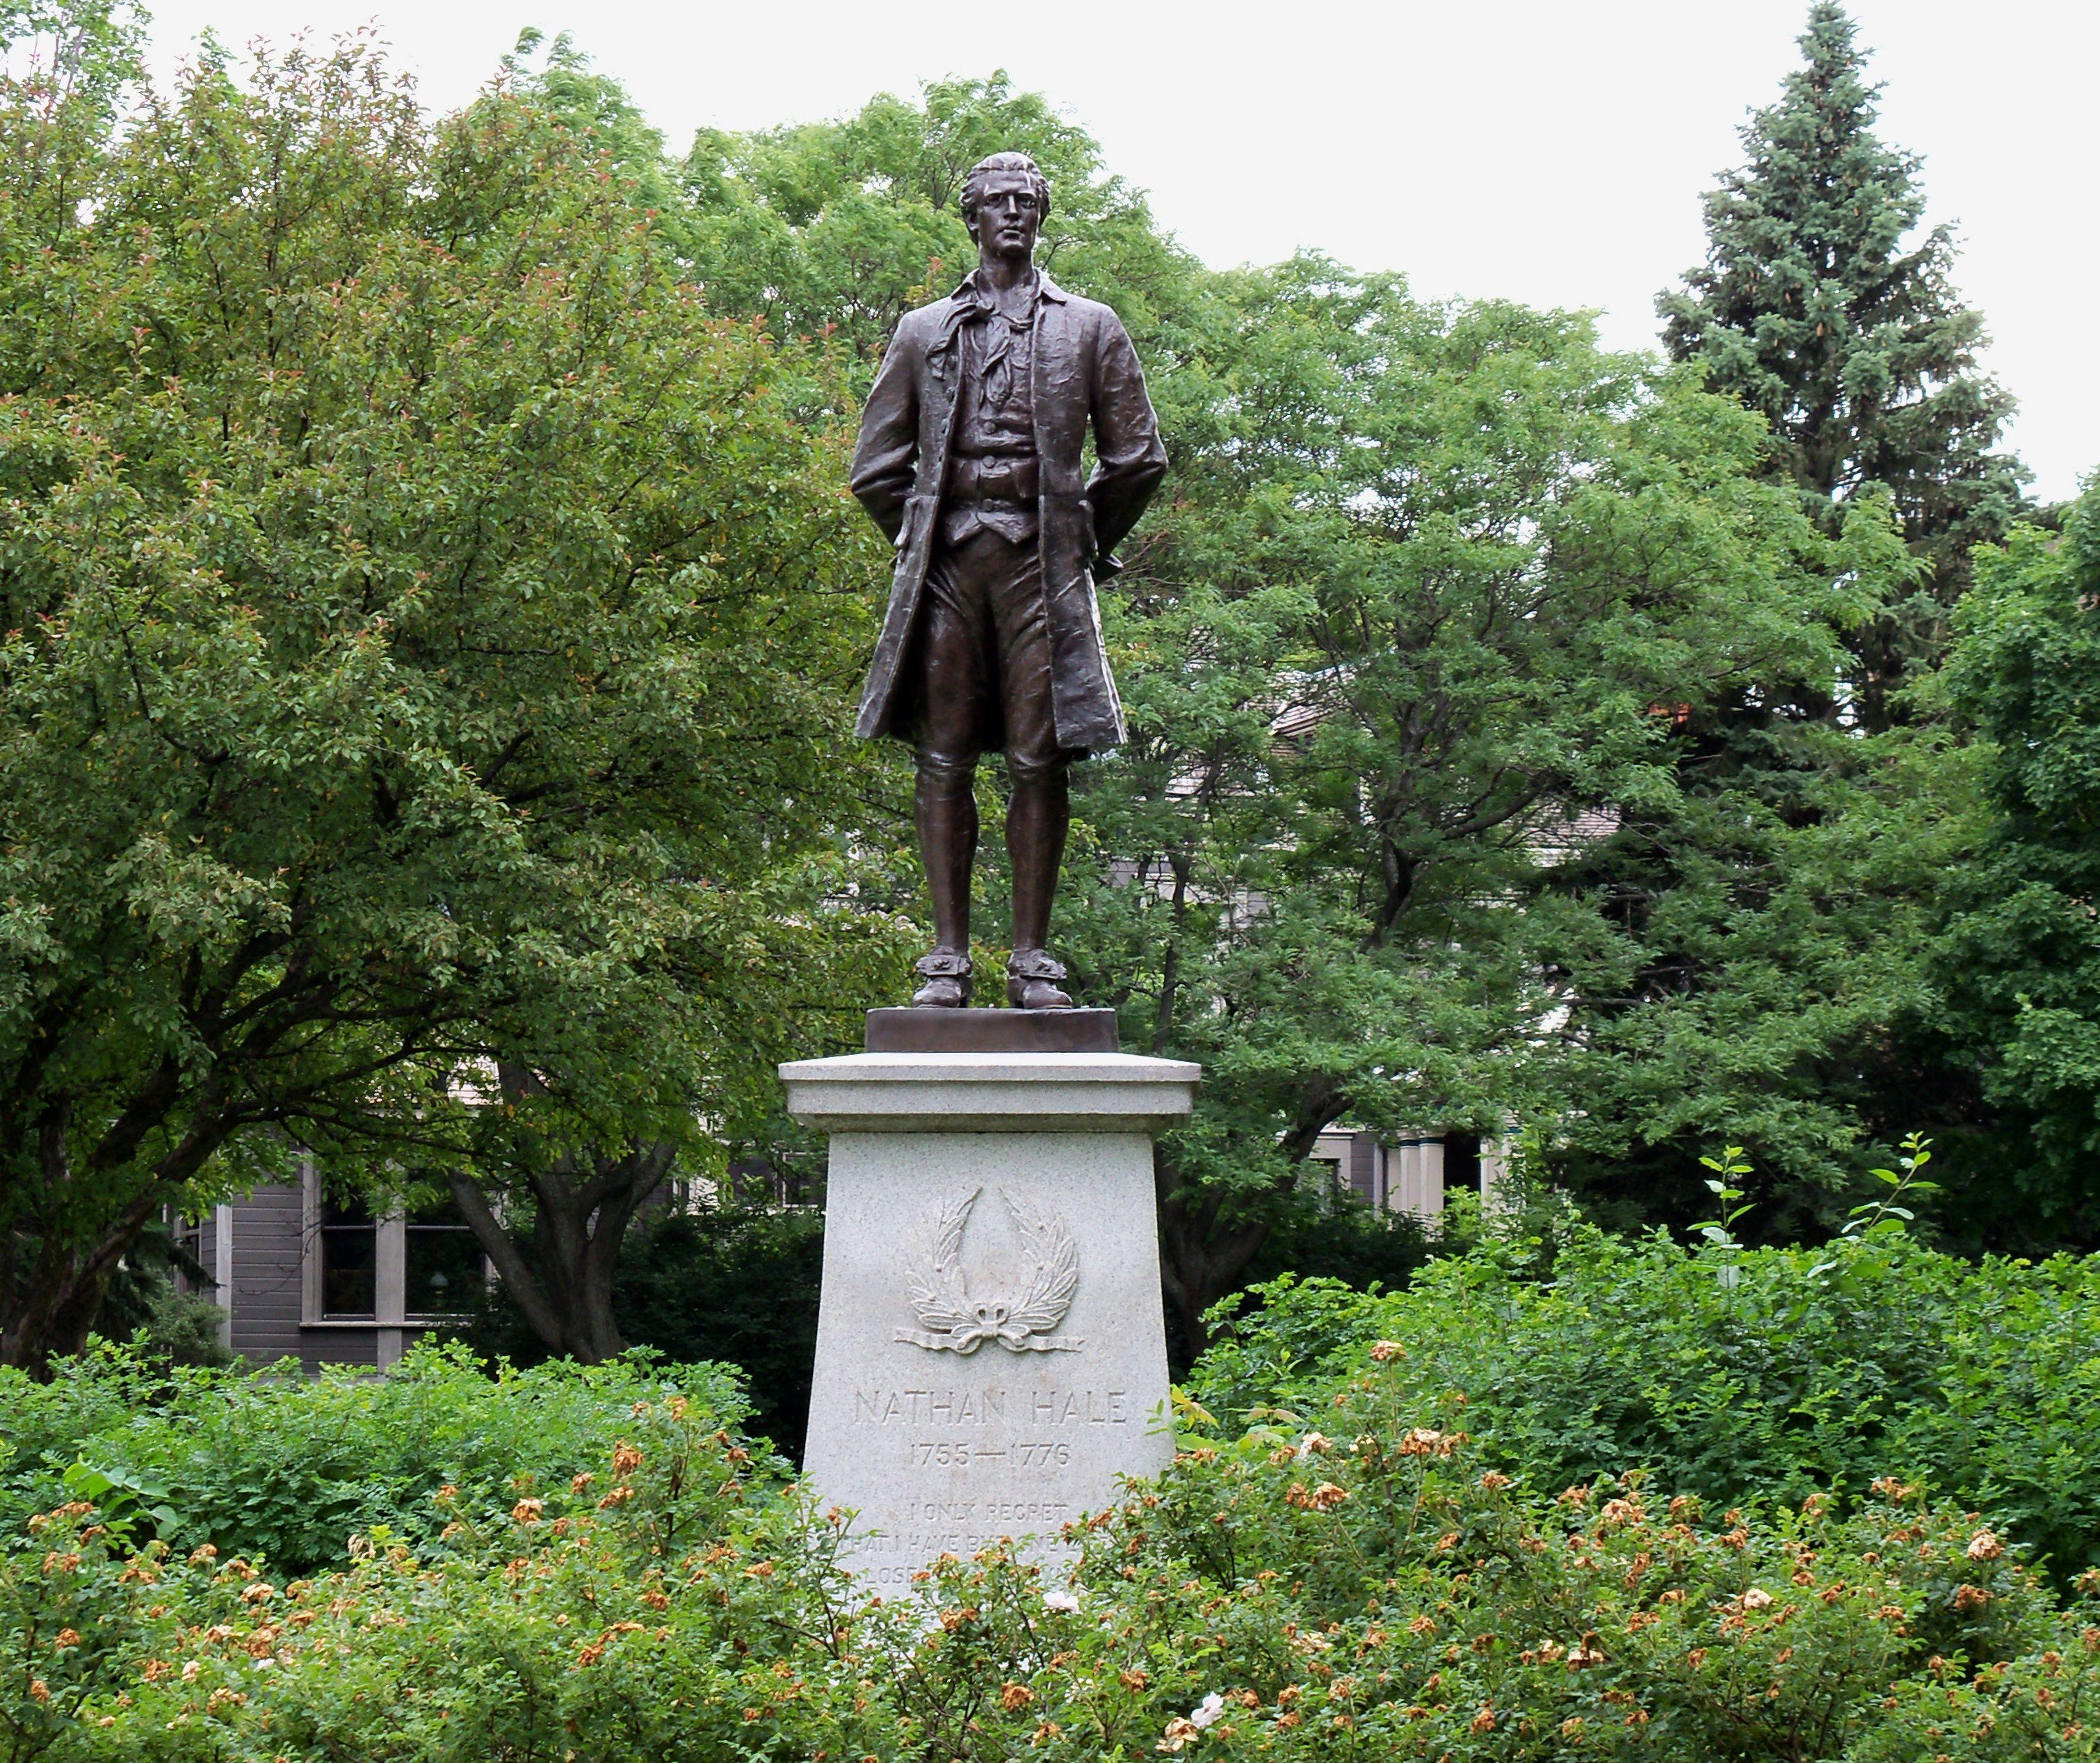 Nathan Hale Statue, St. Paul, Minnesota